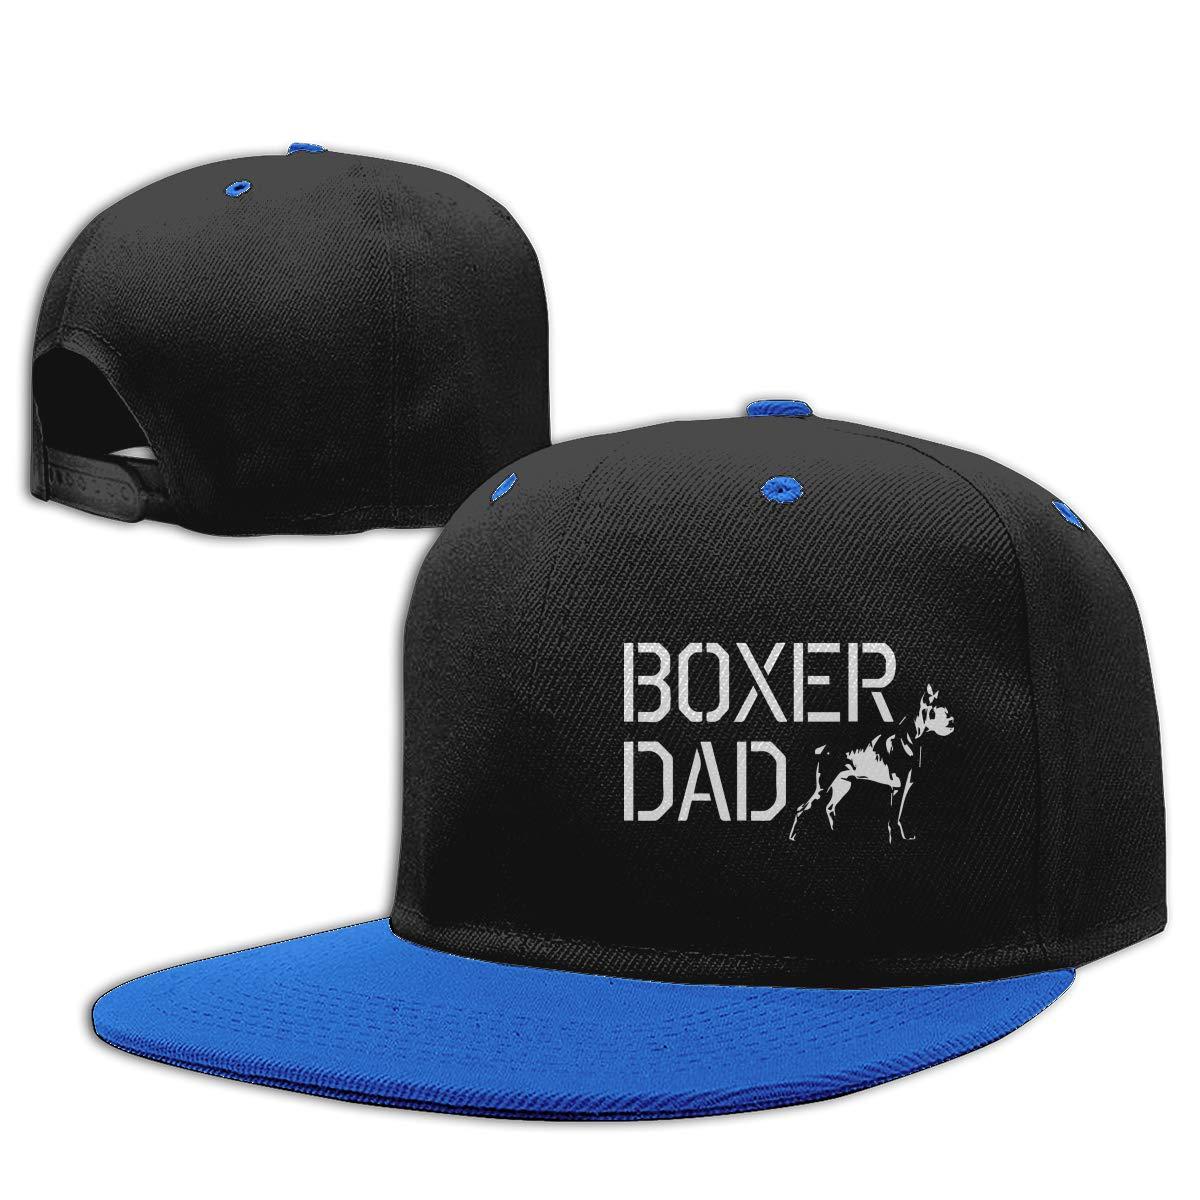 NMG-01 Men and Women Dad Hat Boxer Dad2 Fashion Hip-Hop Baseball Caps